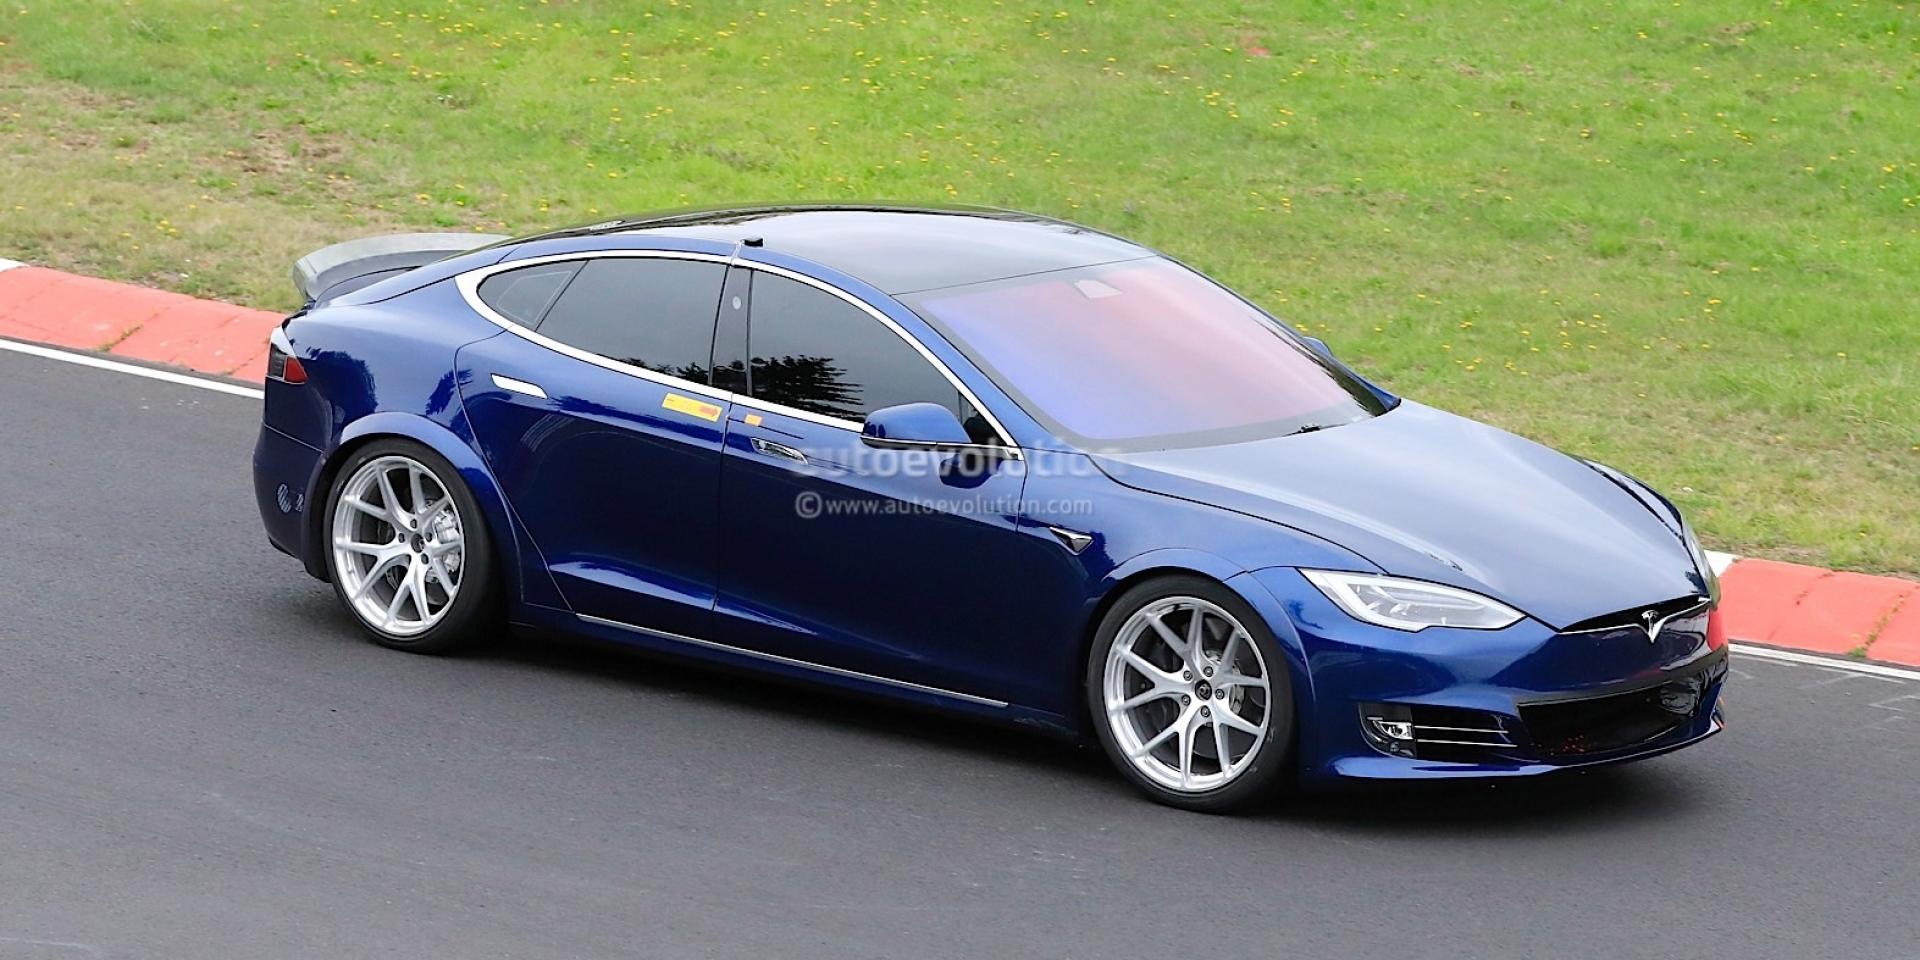 Tesla三馬達車型亮相!Model S Plaid馬力突破1100hp!